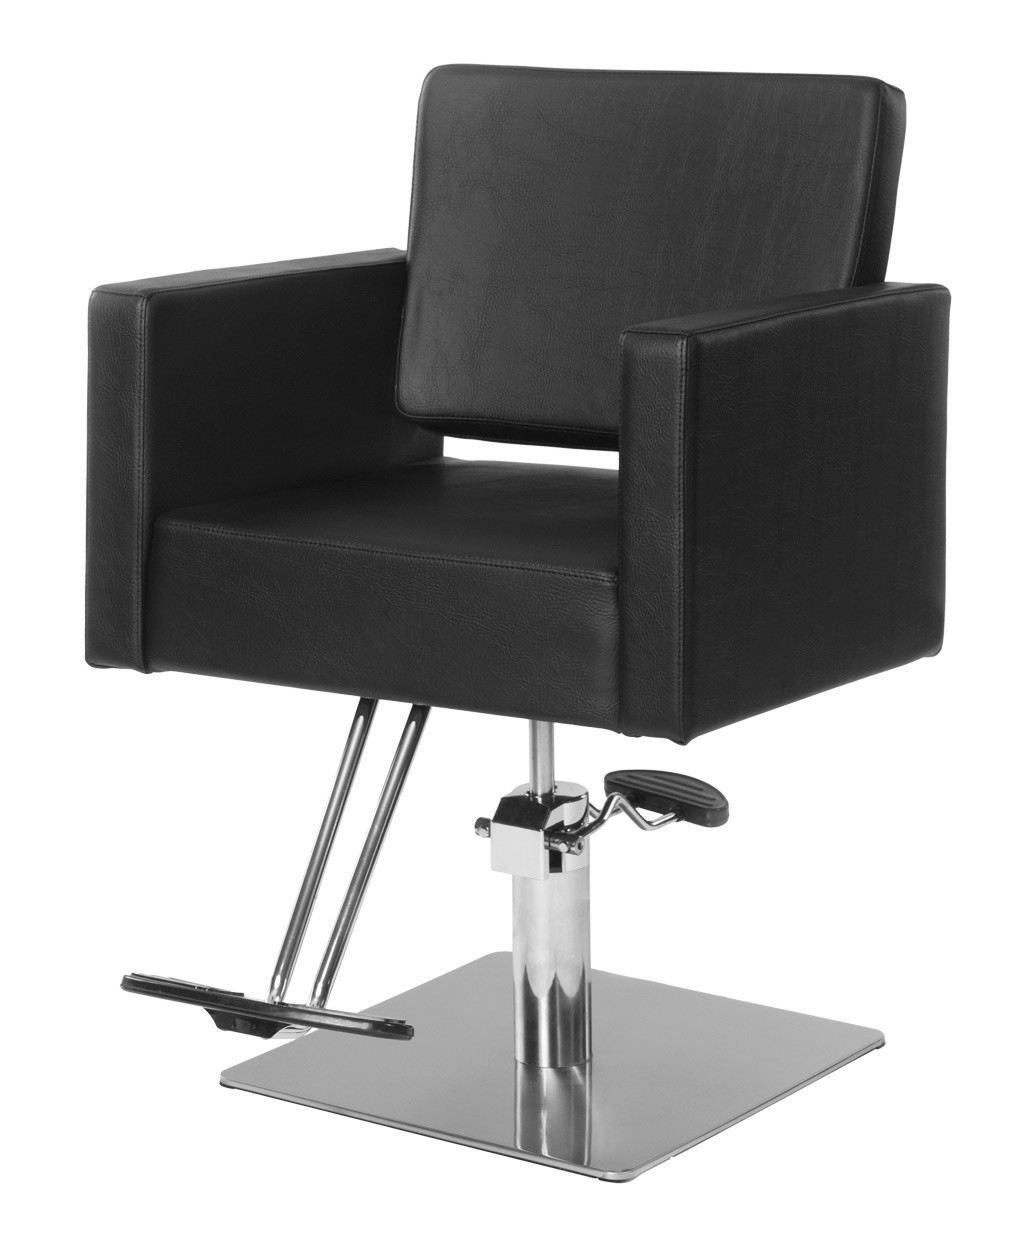 Black salon chairs - Christina Styling Chair Black